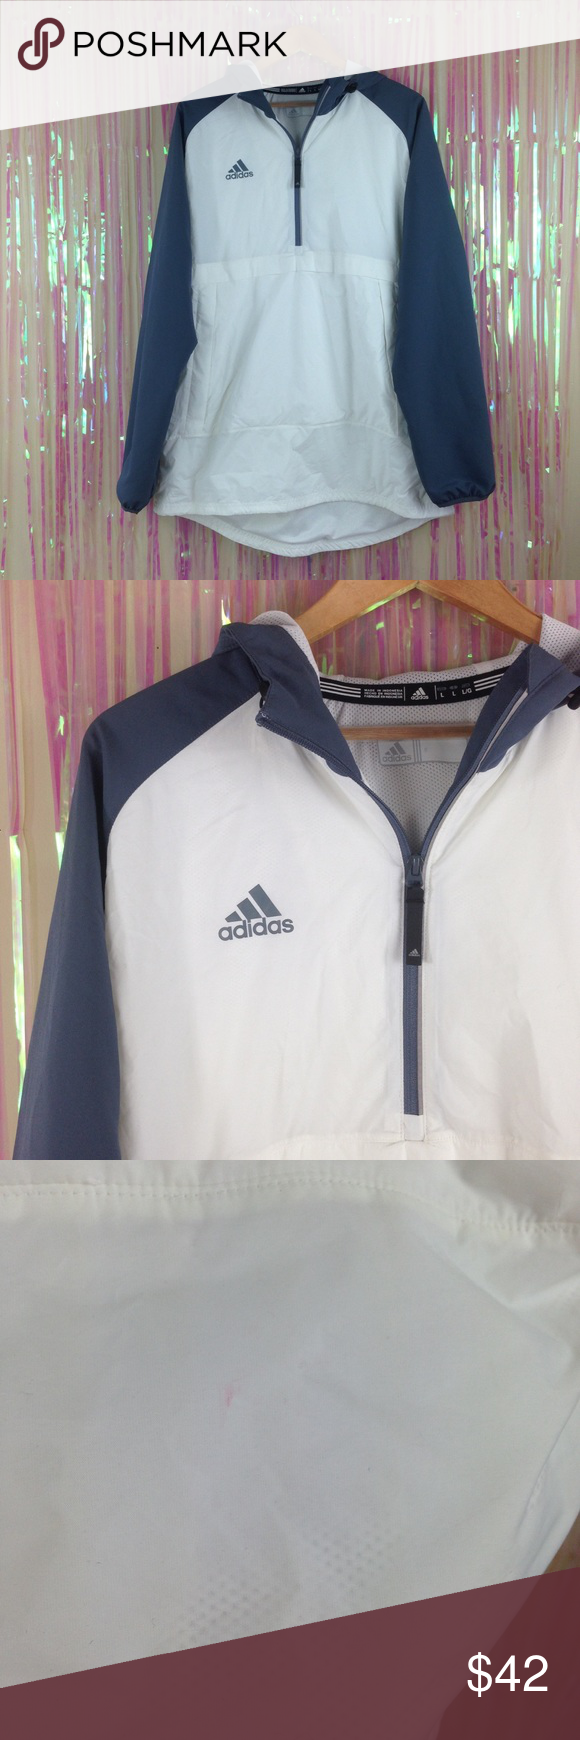 Adidas windbreaker jacket nylon mens womens T139 Adidas gray white windbreaker  jacket nylon coat mens womens